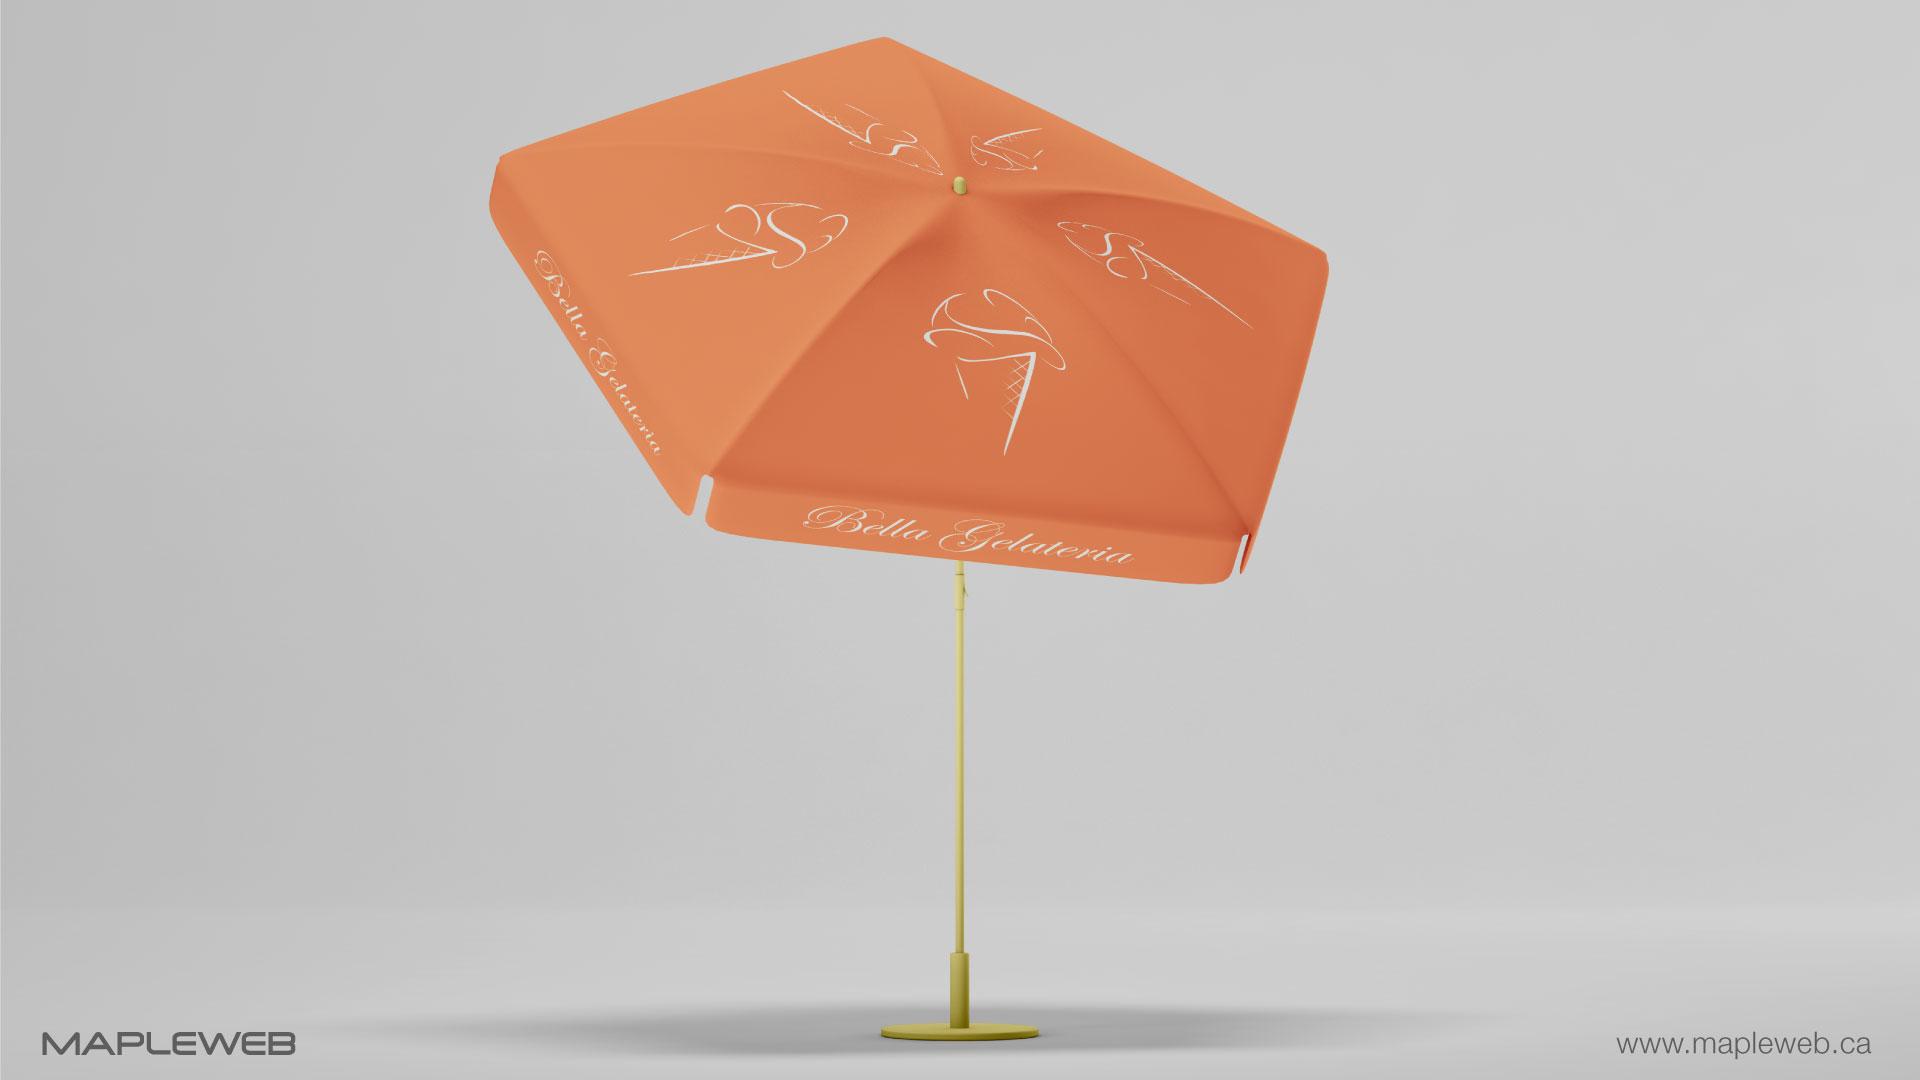 bella-gelateria-brand-logo-design-by-mapleweb-vancouver-canada-umbrella-tent-mock